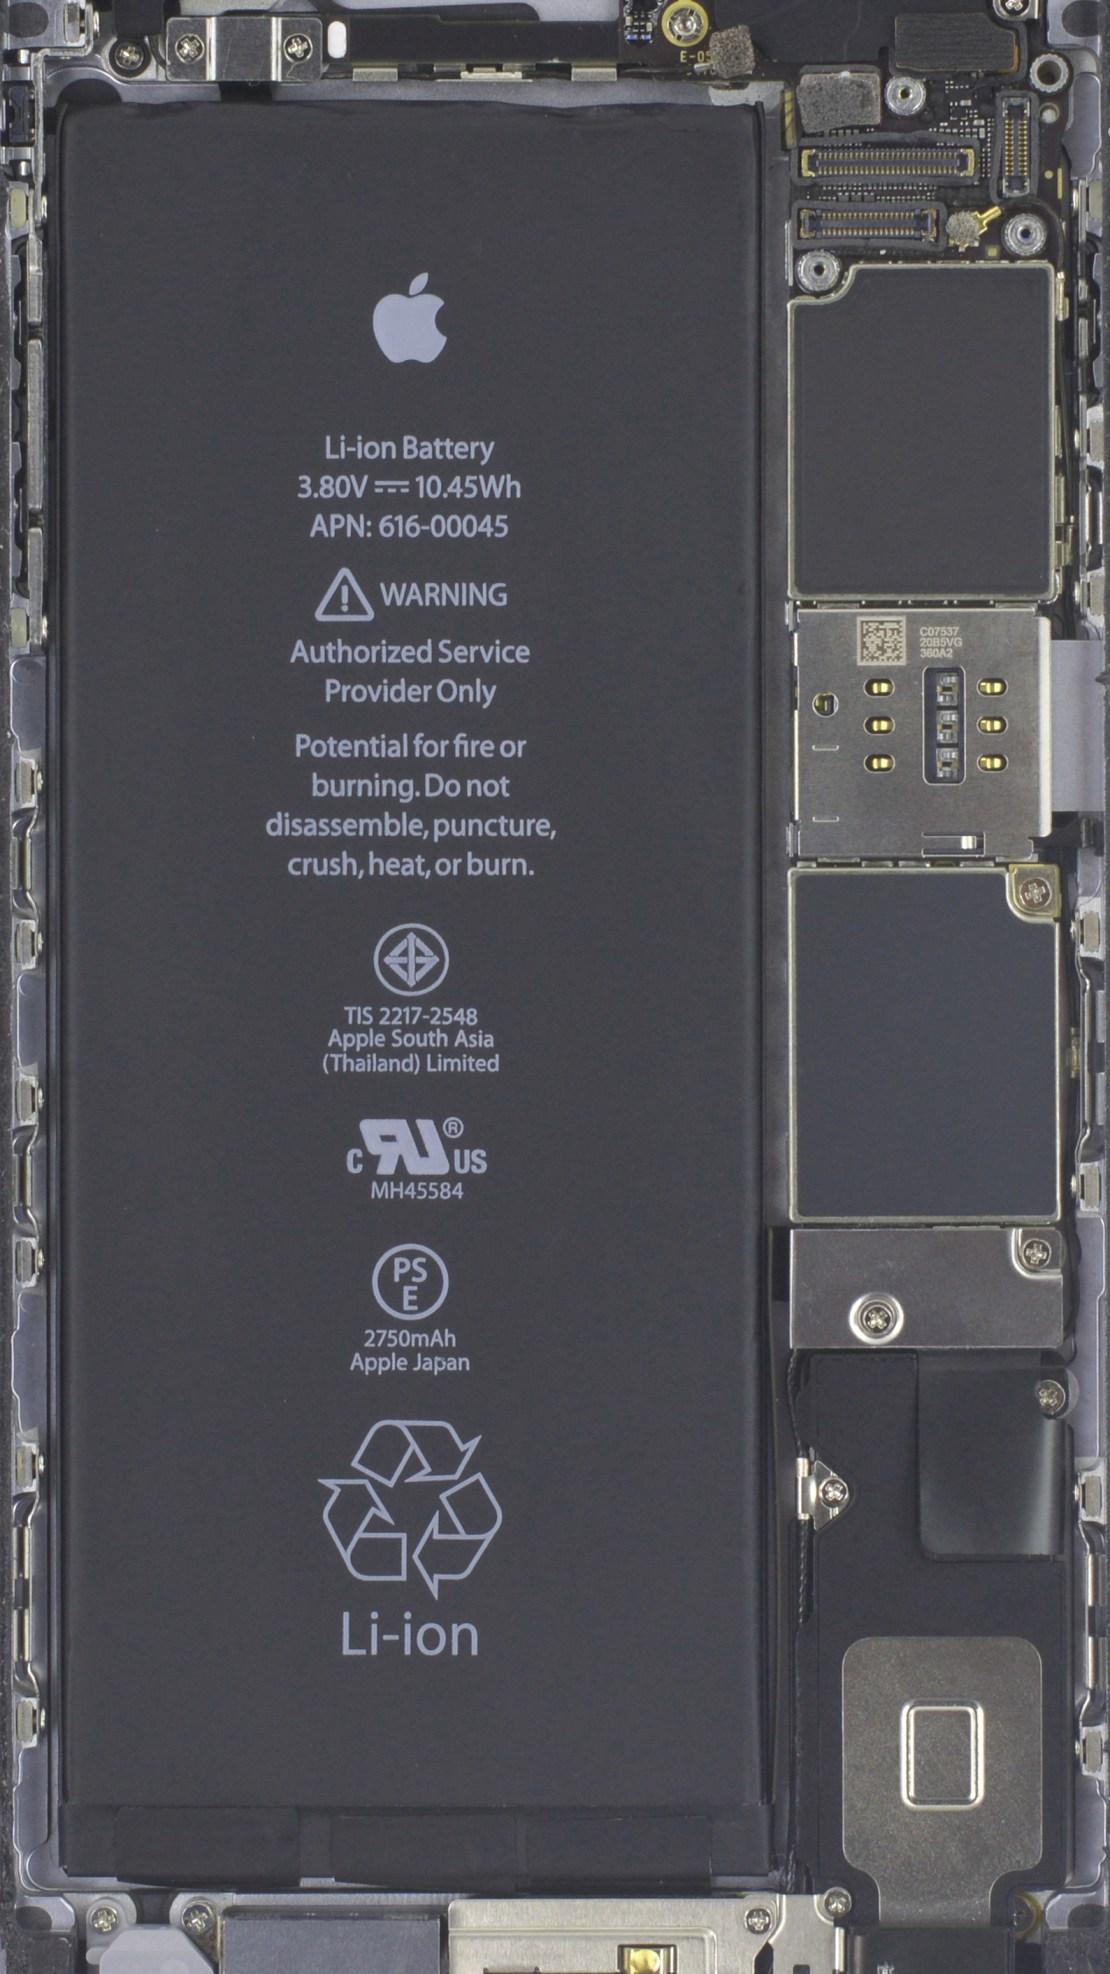 Tapeta iPhone 6s Plus wnętrze smartfona